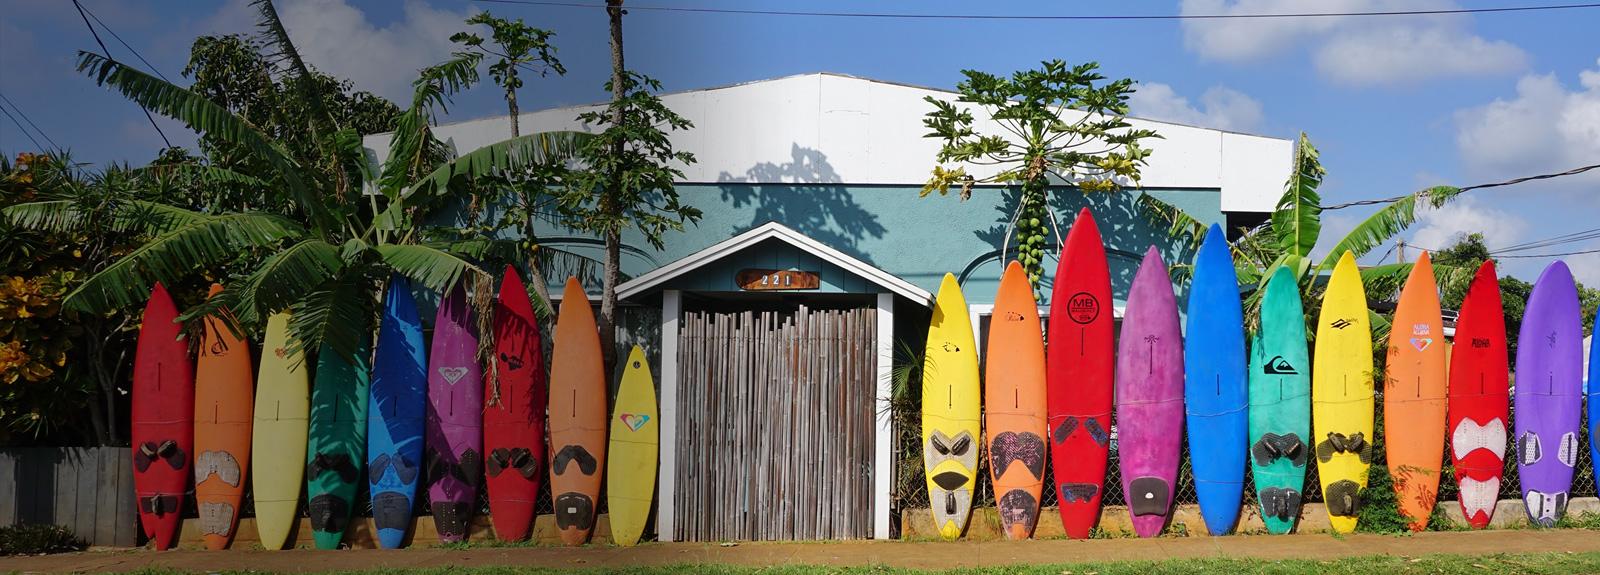 Home warranty companies in hawaii top reviews